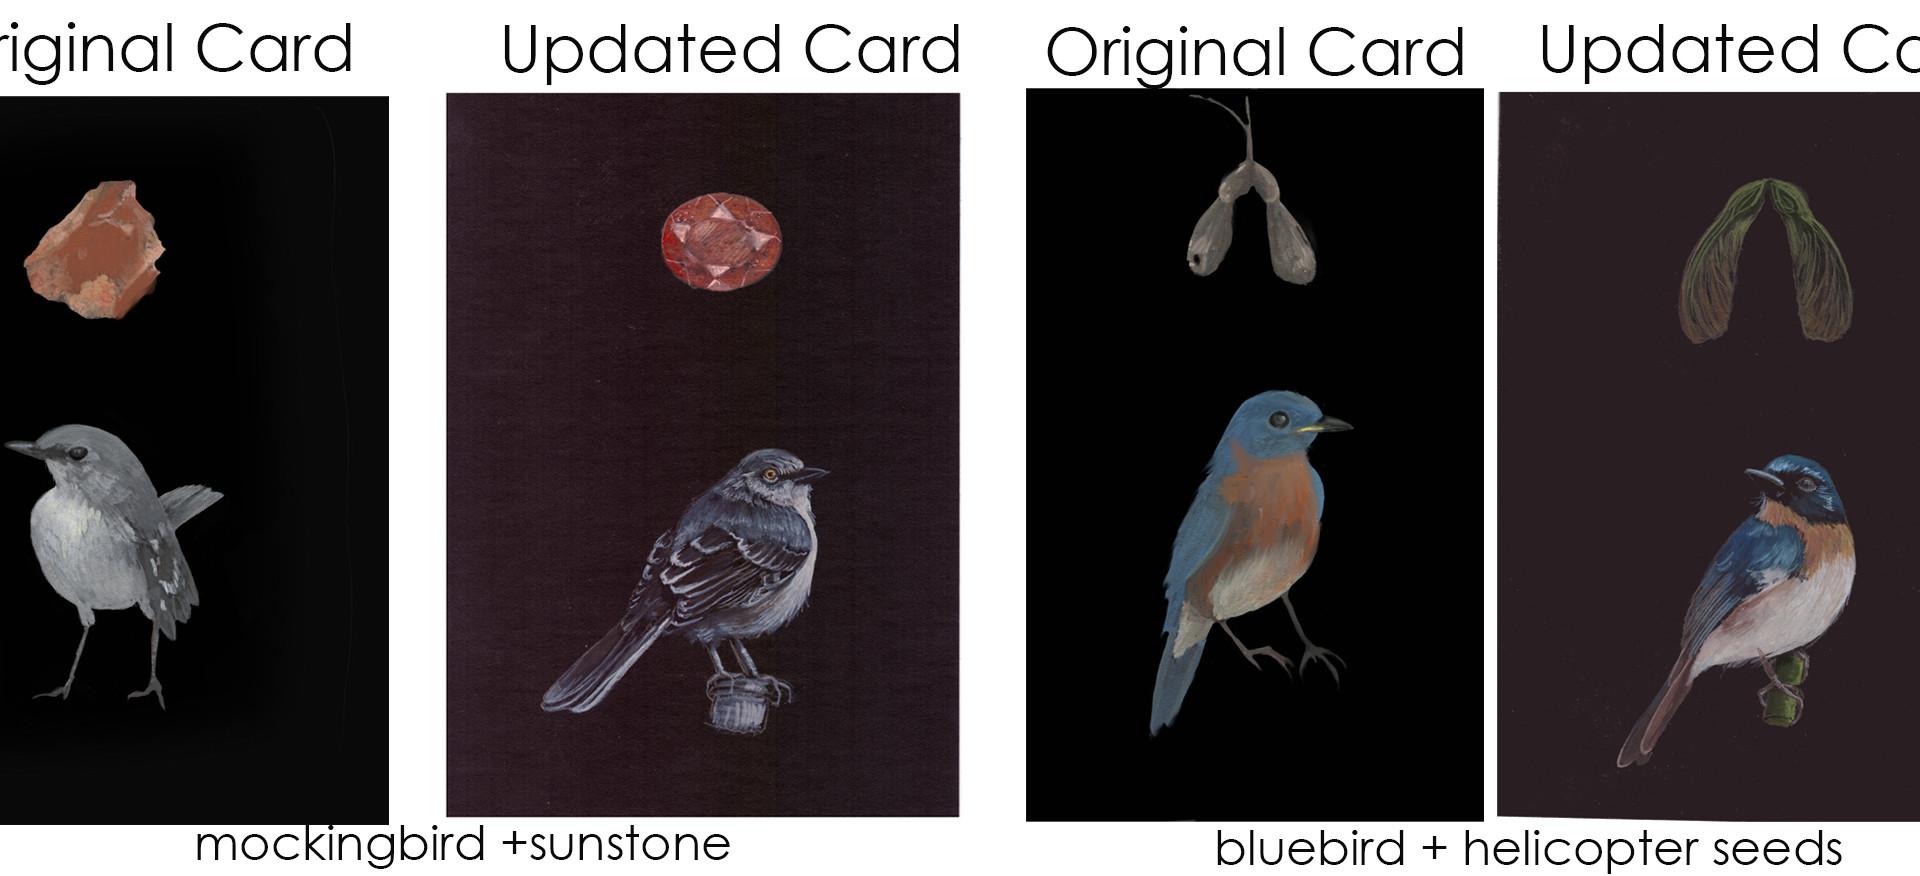 card updates.jpg